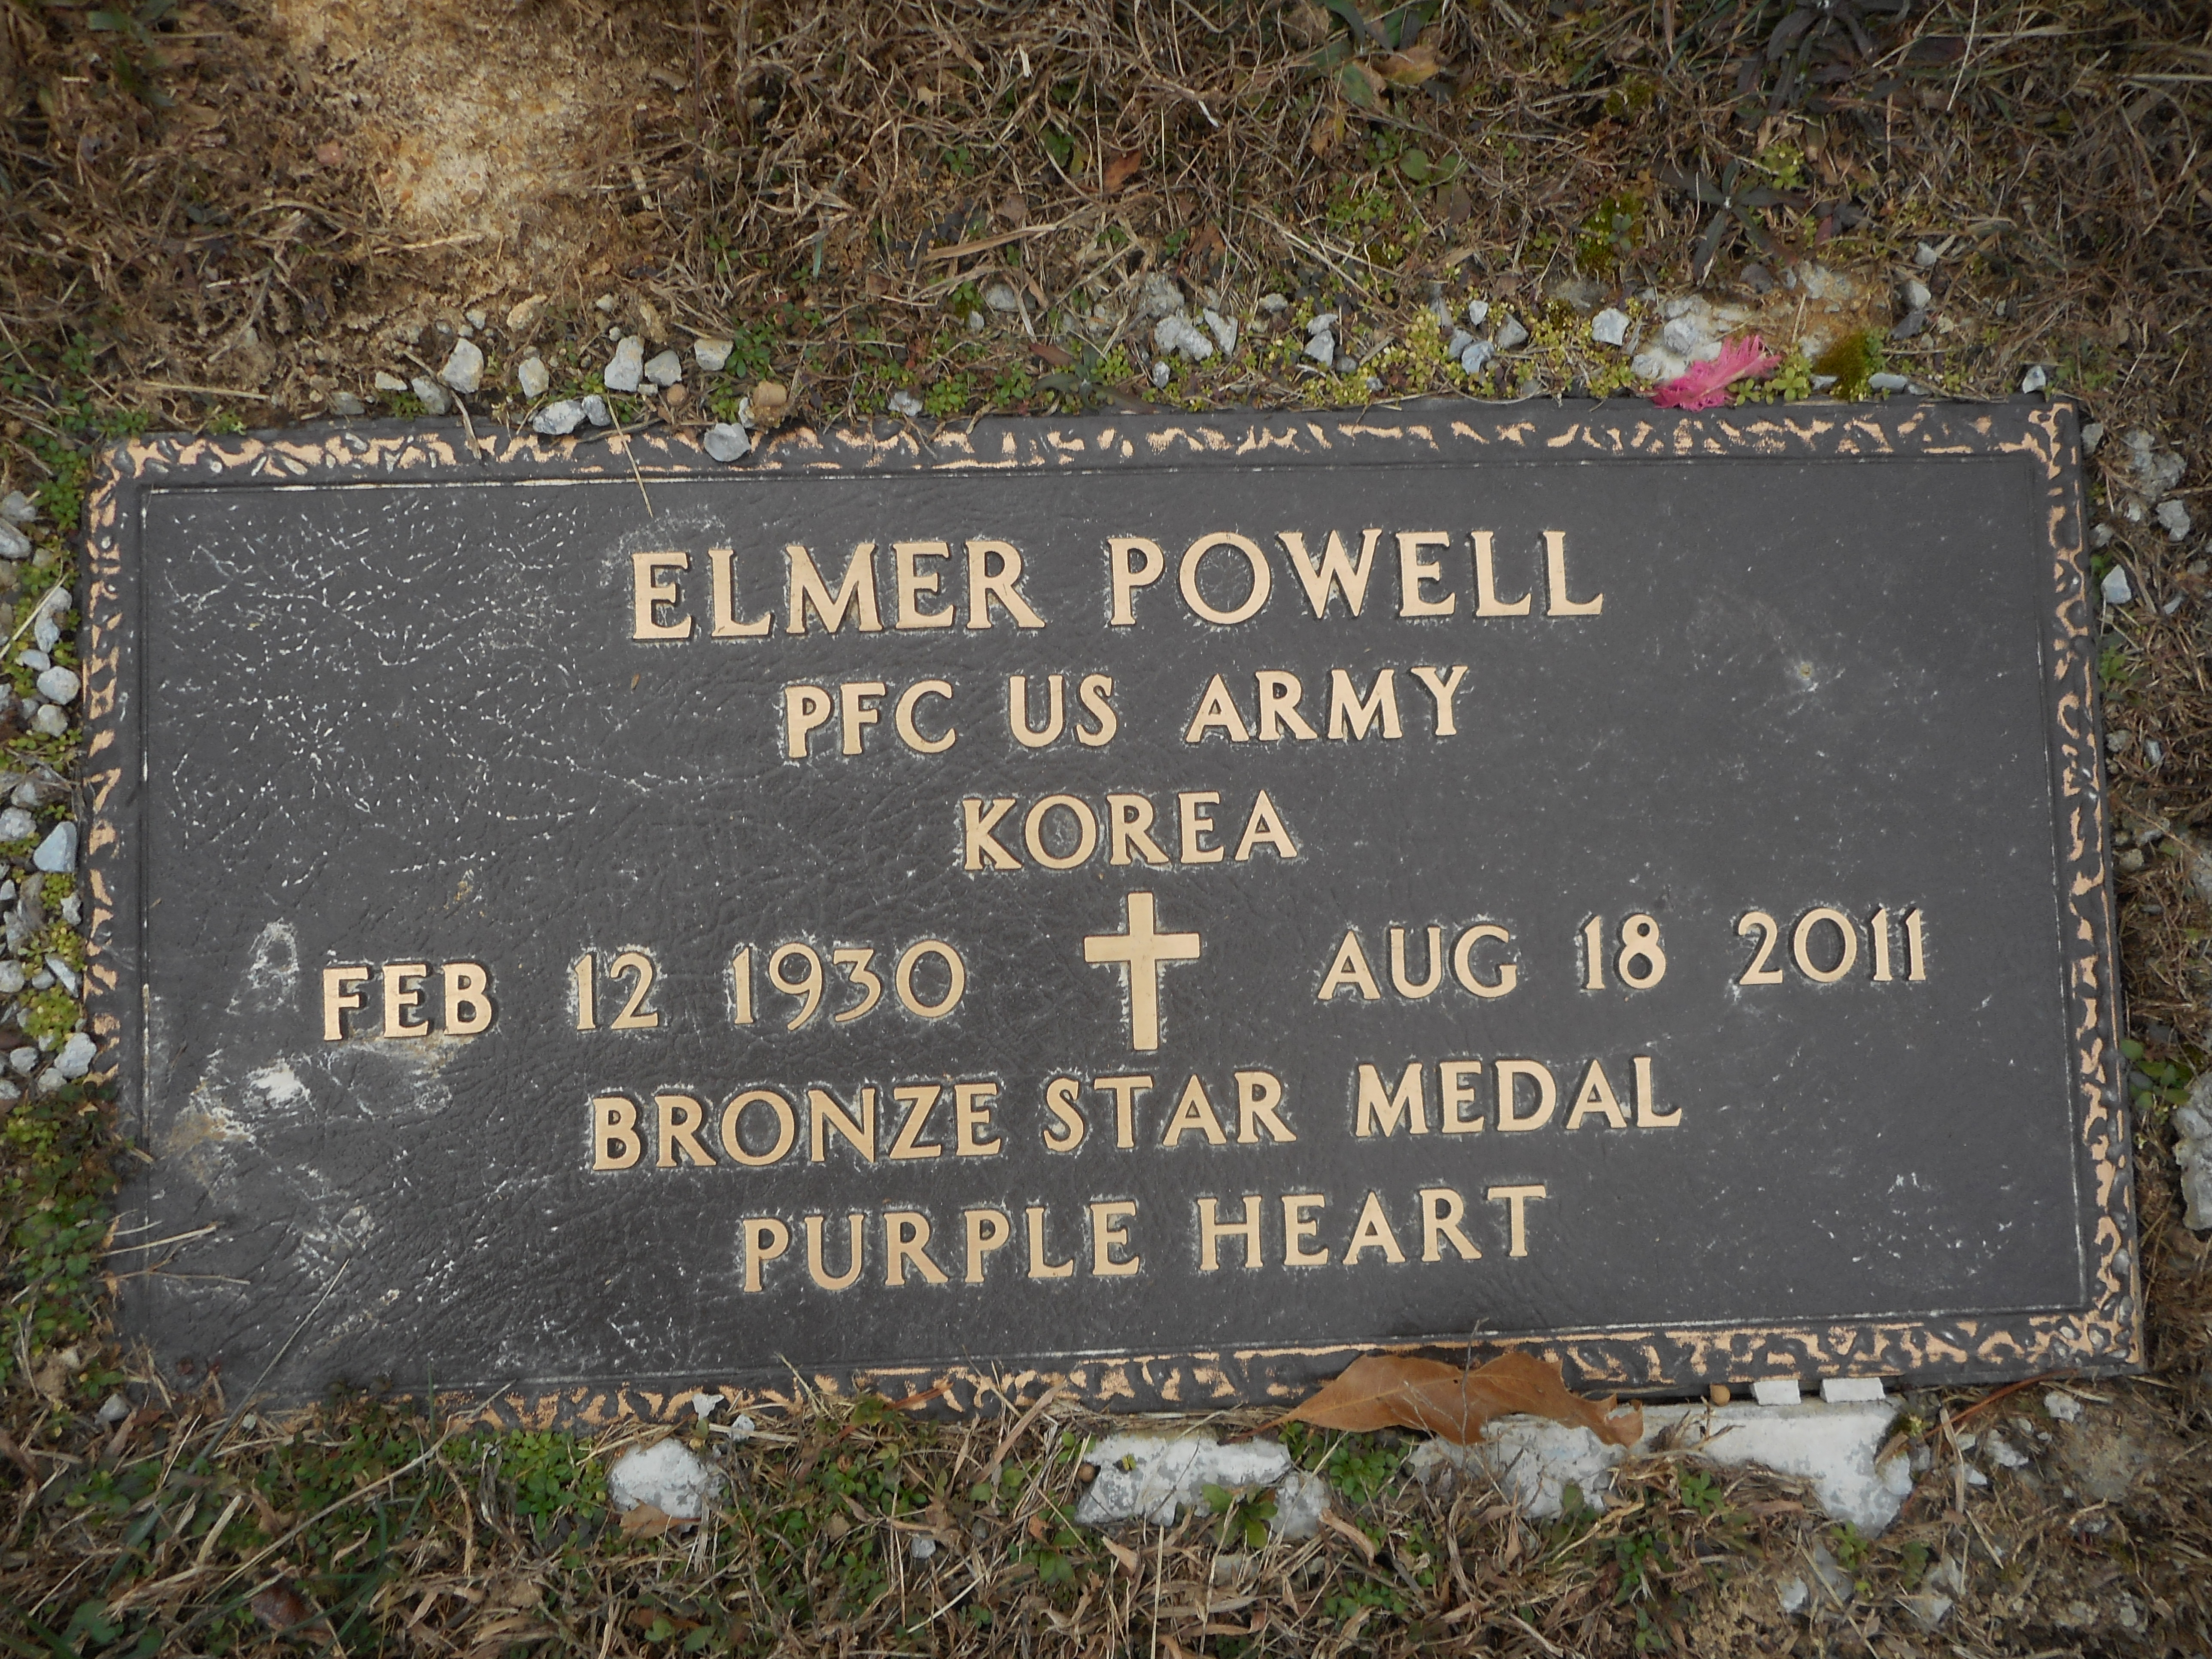 Elmer Powell